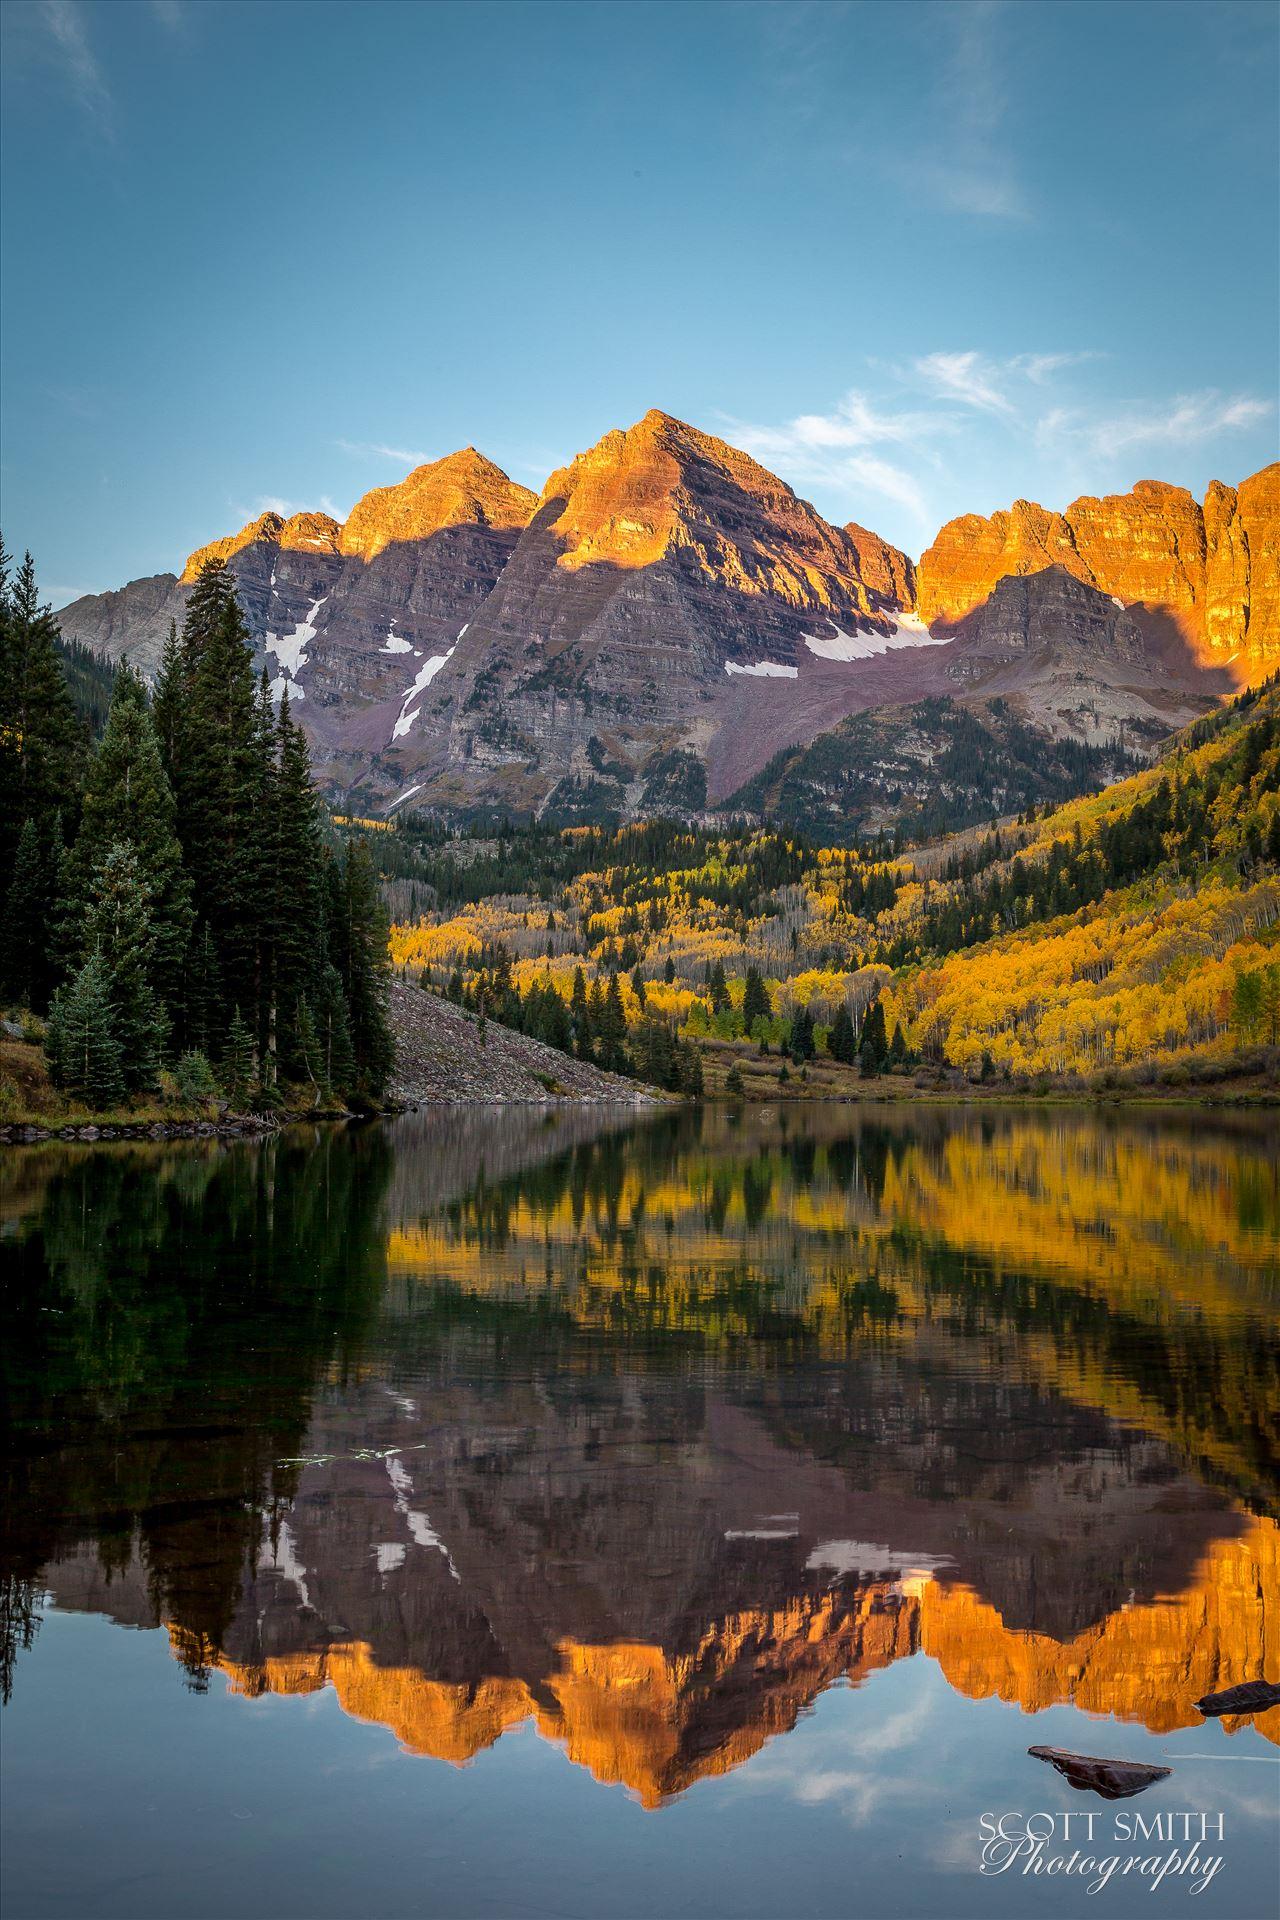 Maroon Bells - The Maroon Bells reflected in Maroon Lake. Taken September, 2014. by D Scott Smith